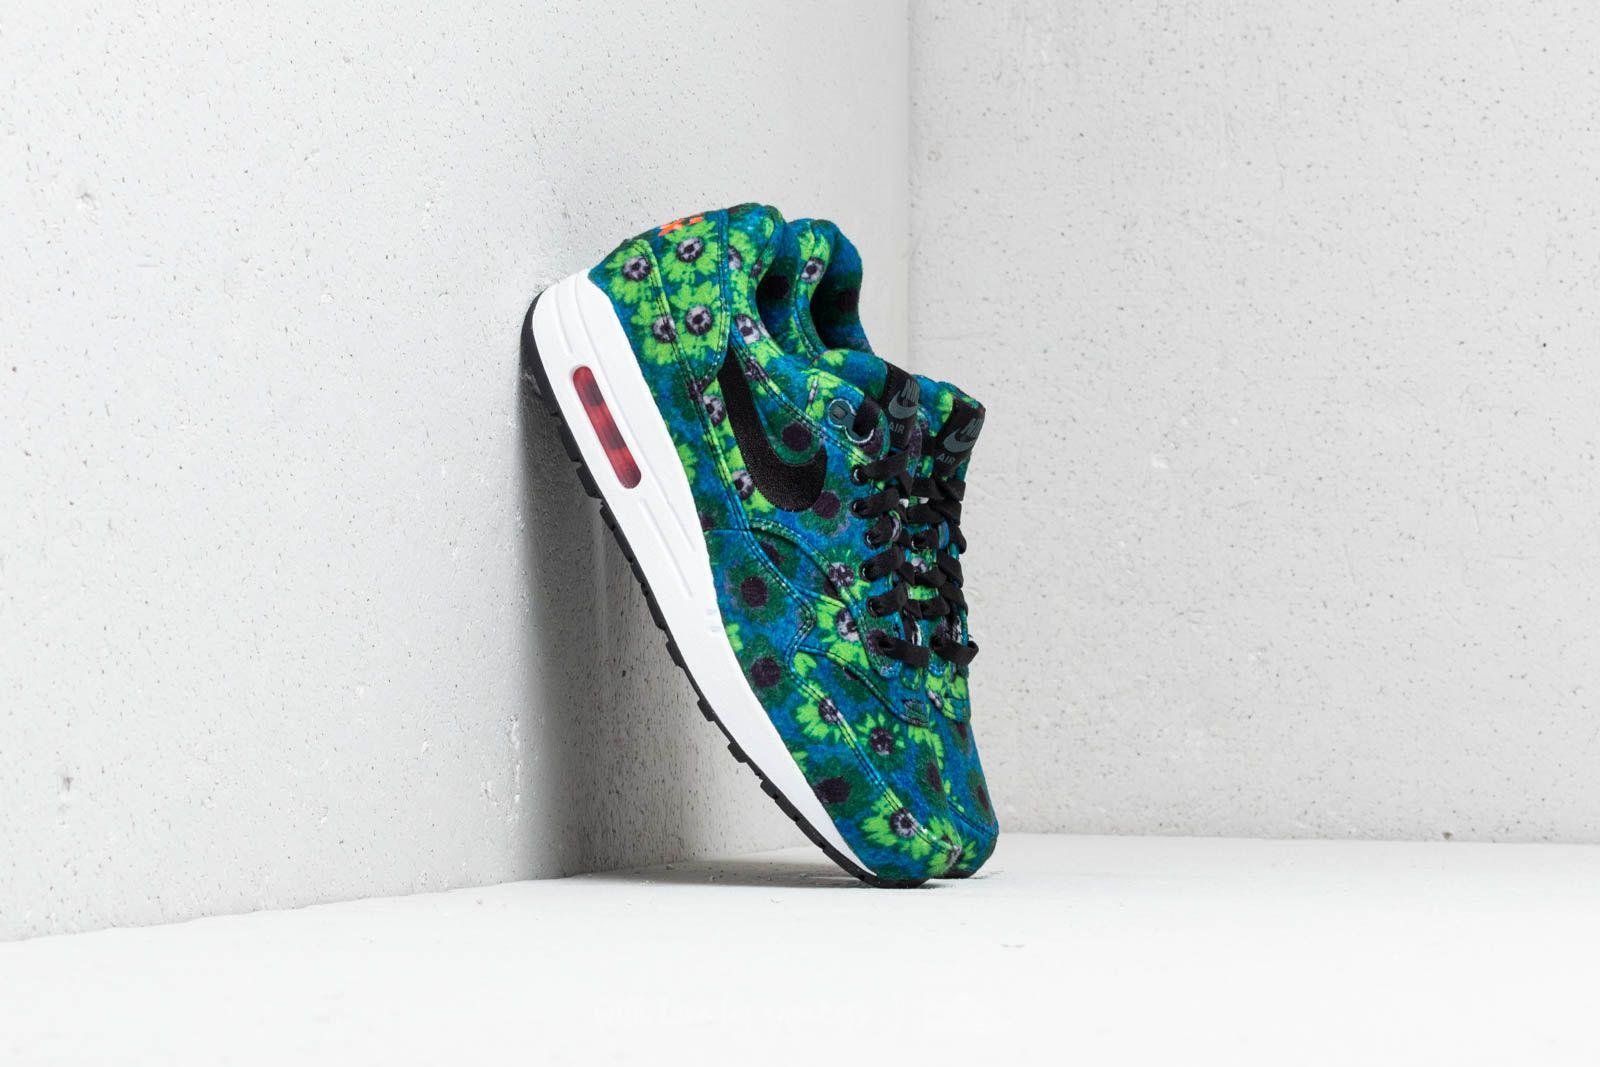 Nike Air Max 1 Premium SE Oil Grey/ Oil Grey-Volt za skvělou cenu 2 720 Kč koupíte na Footshop.cz